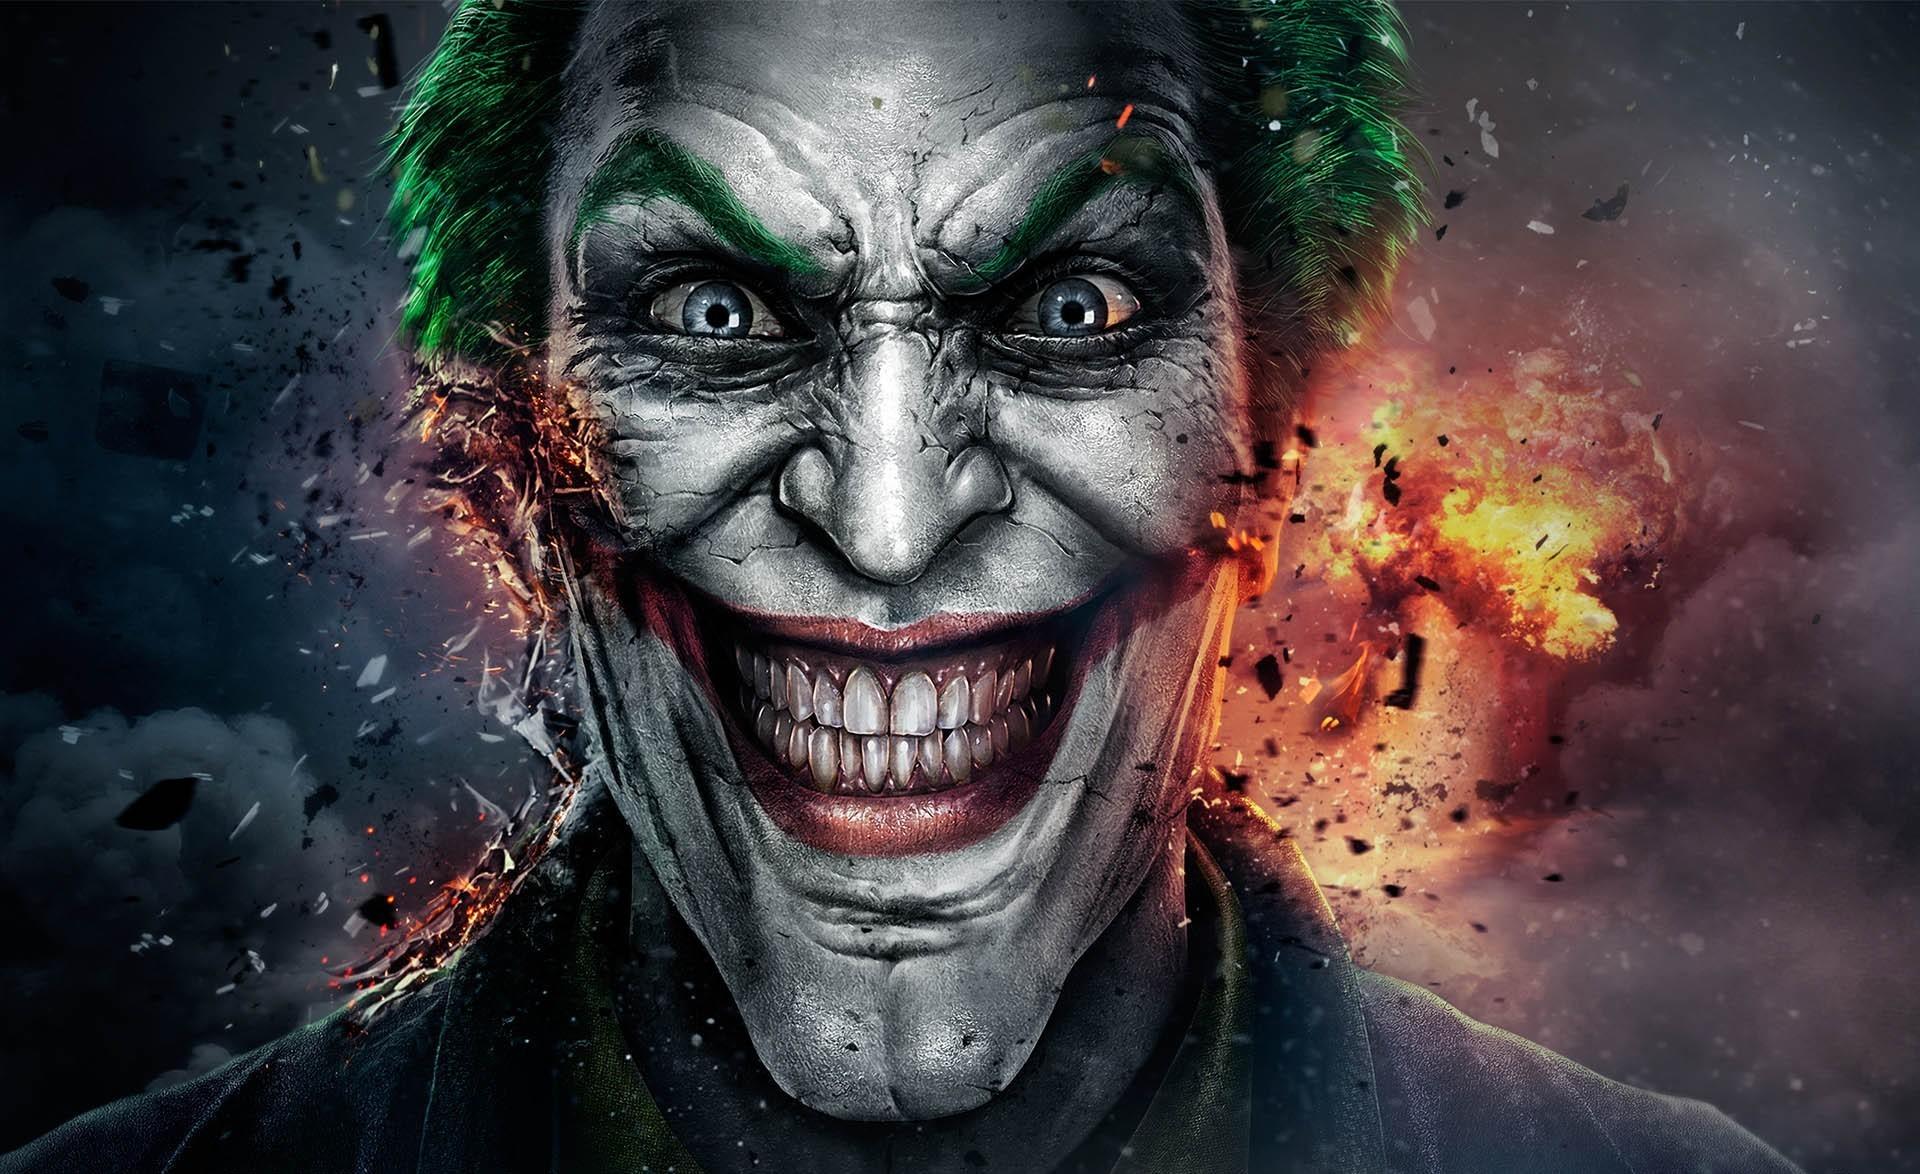 Hd wallpaper of joker - Hd Wallpaper Of Joker The Joker Wallpaper 1920x1174 Download